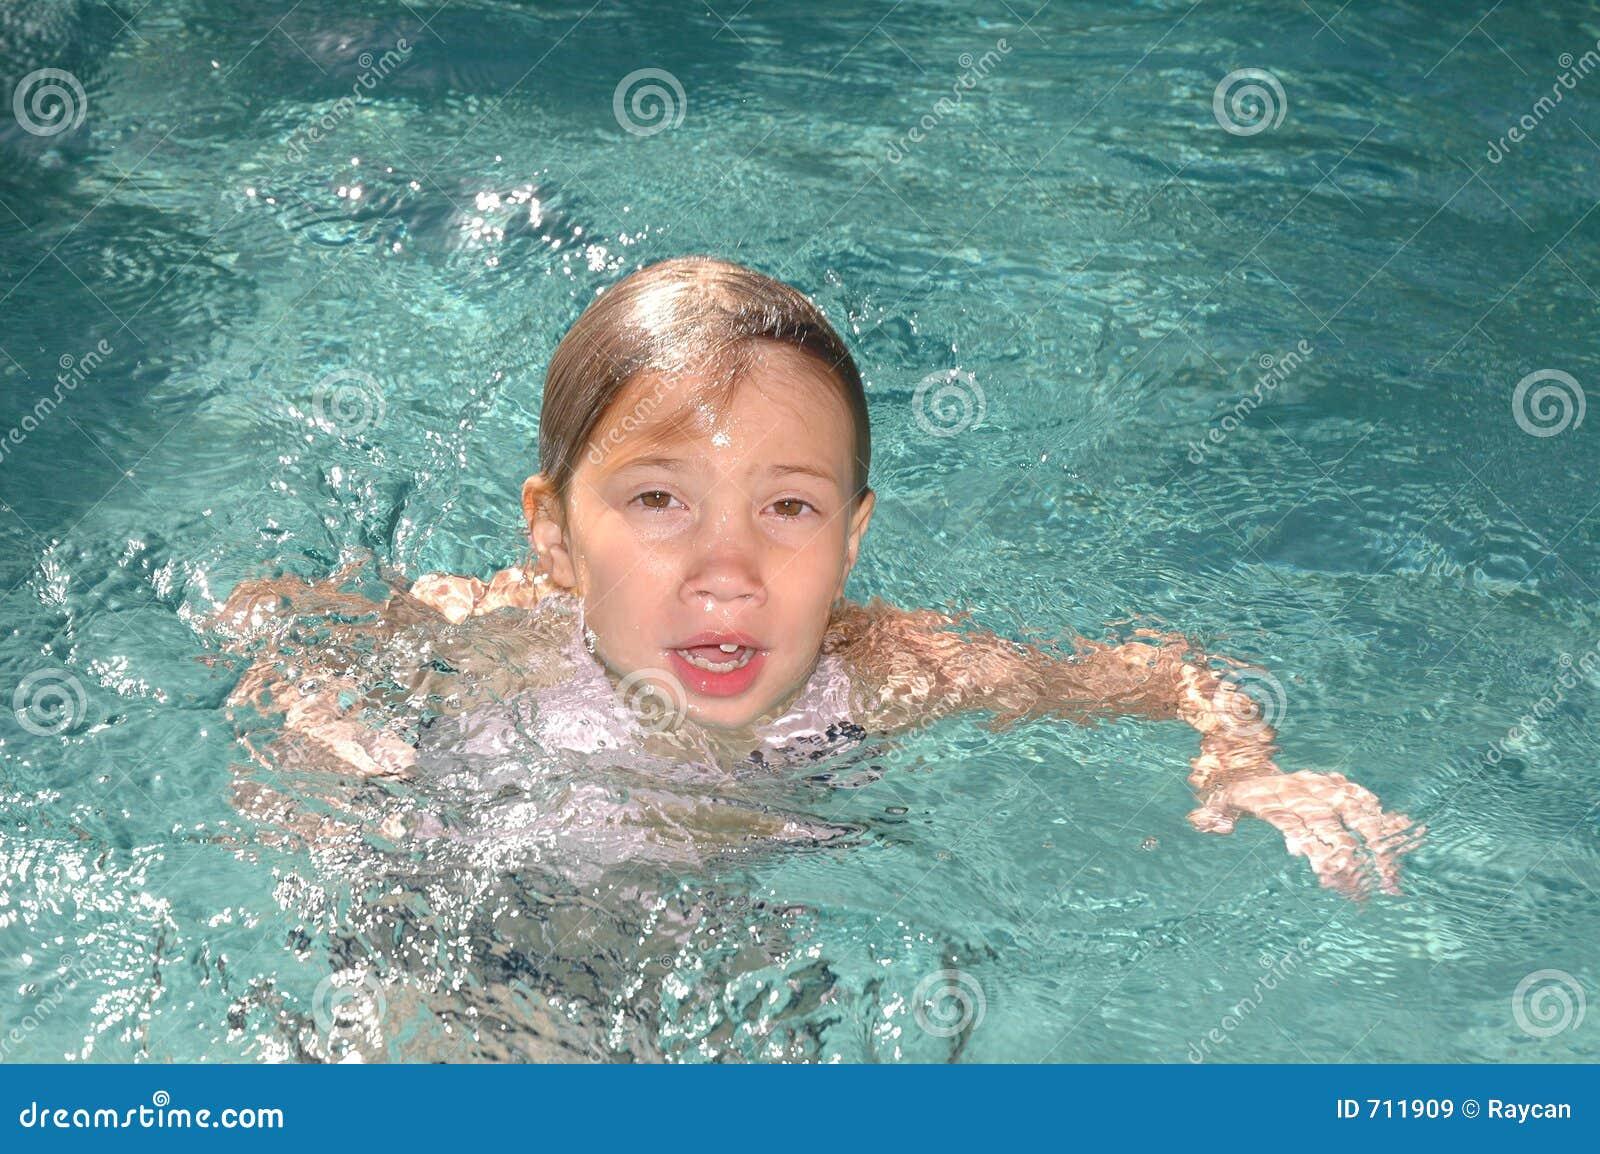 Drowning Series 4